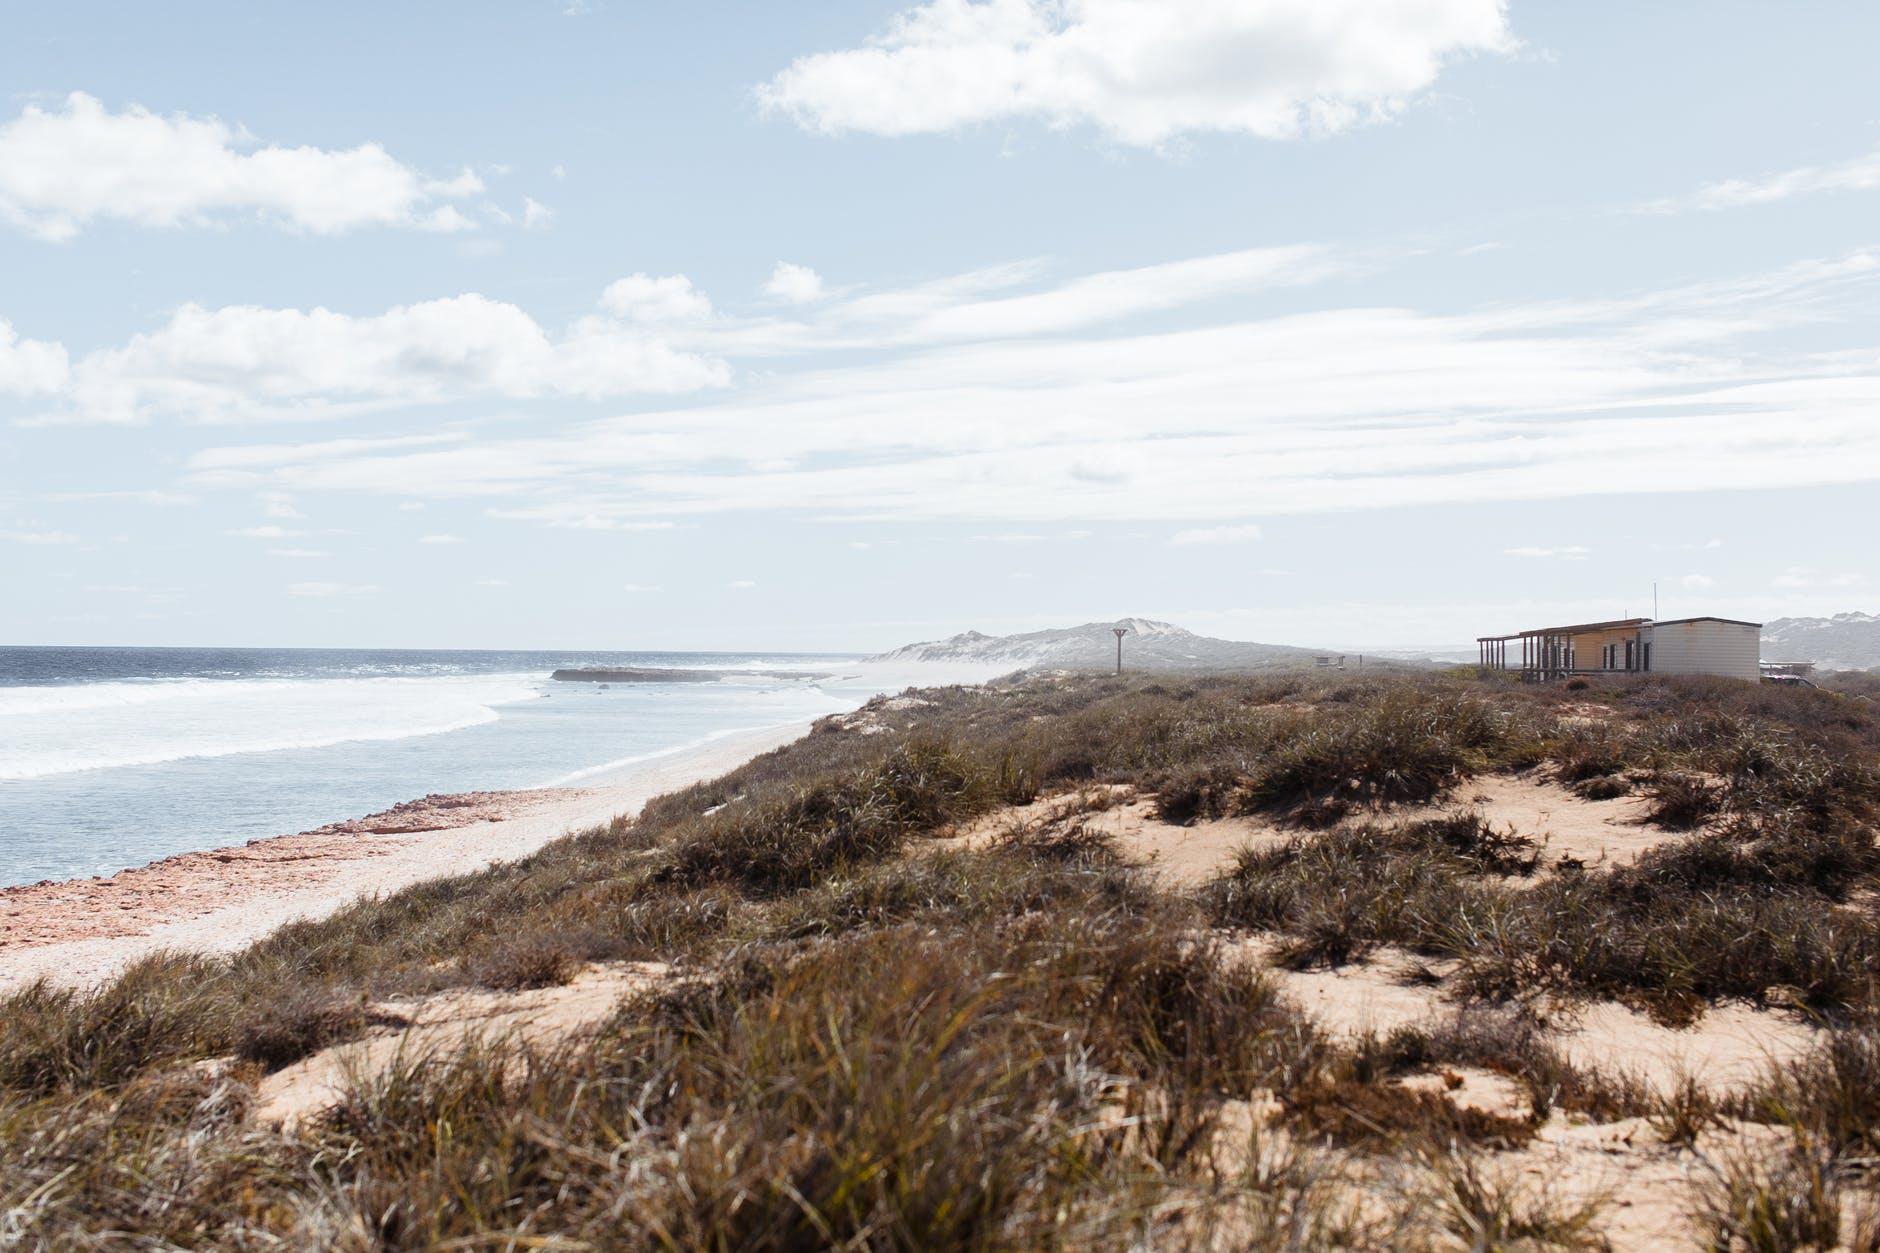 mountainous beach with houses against foamy sea